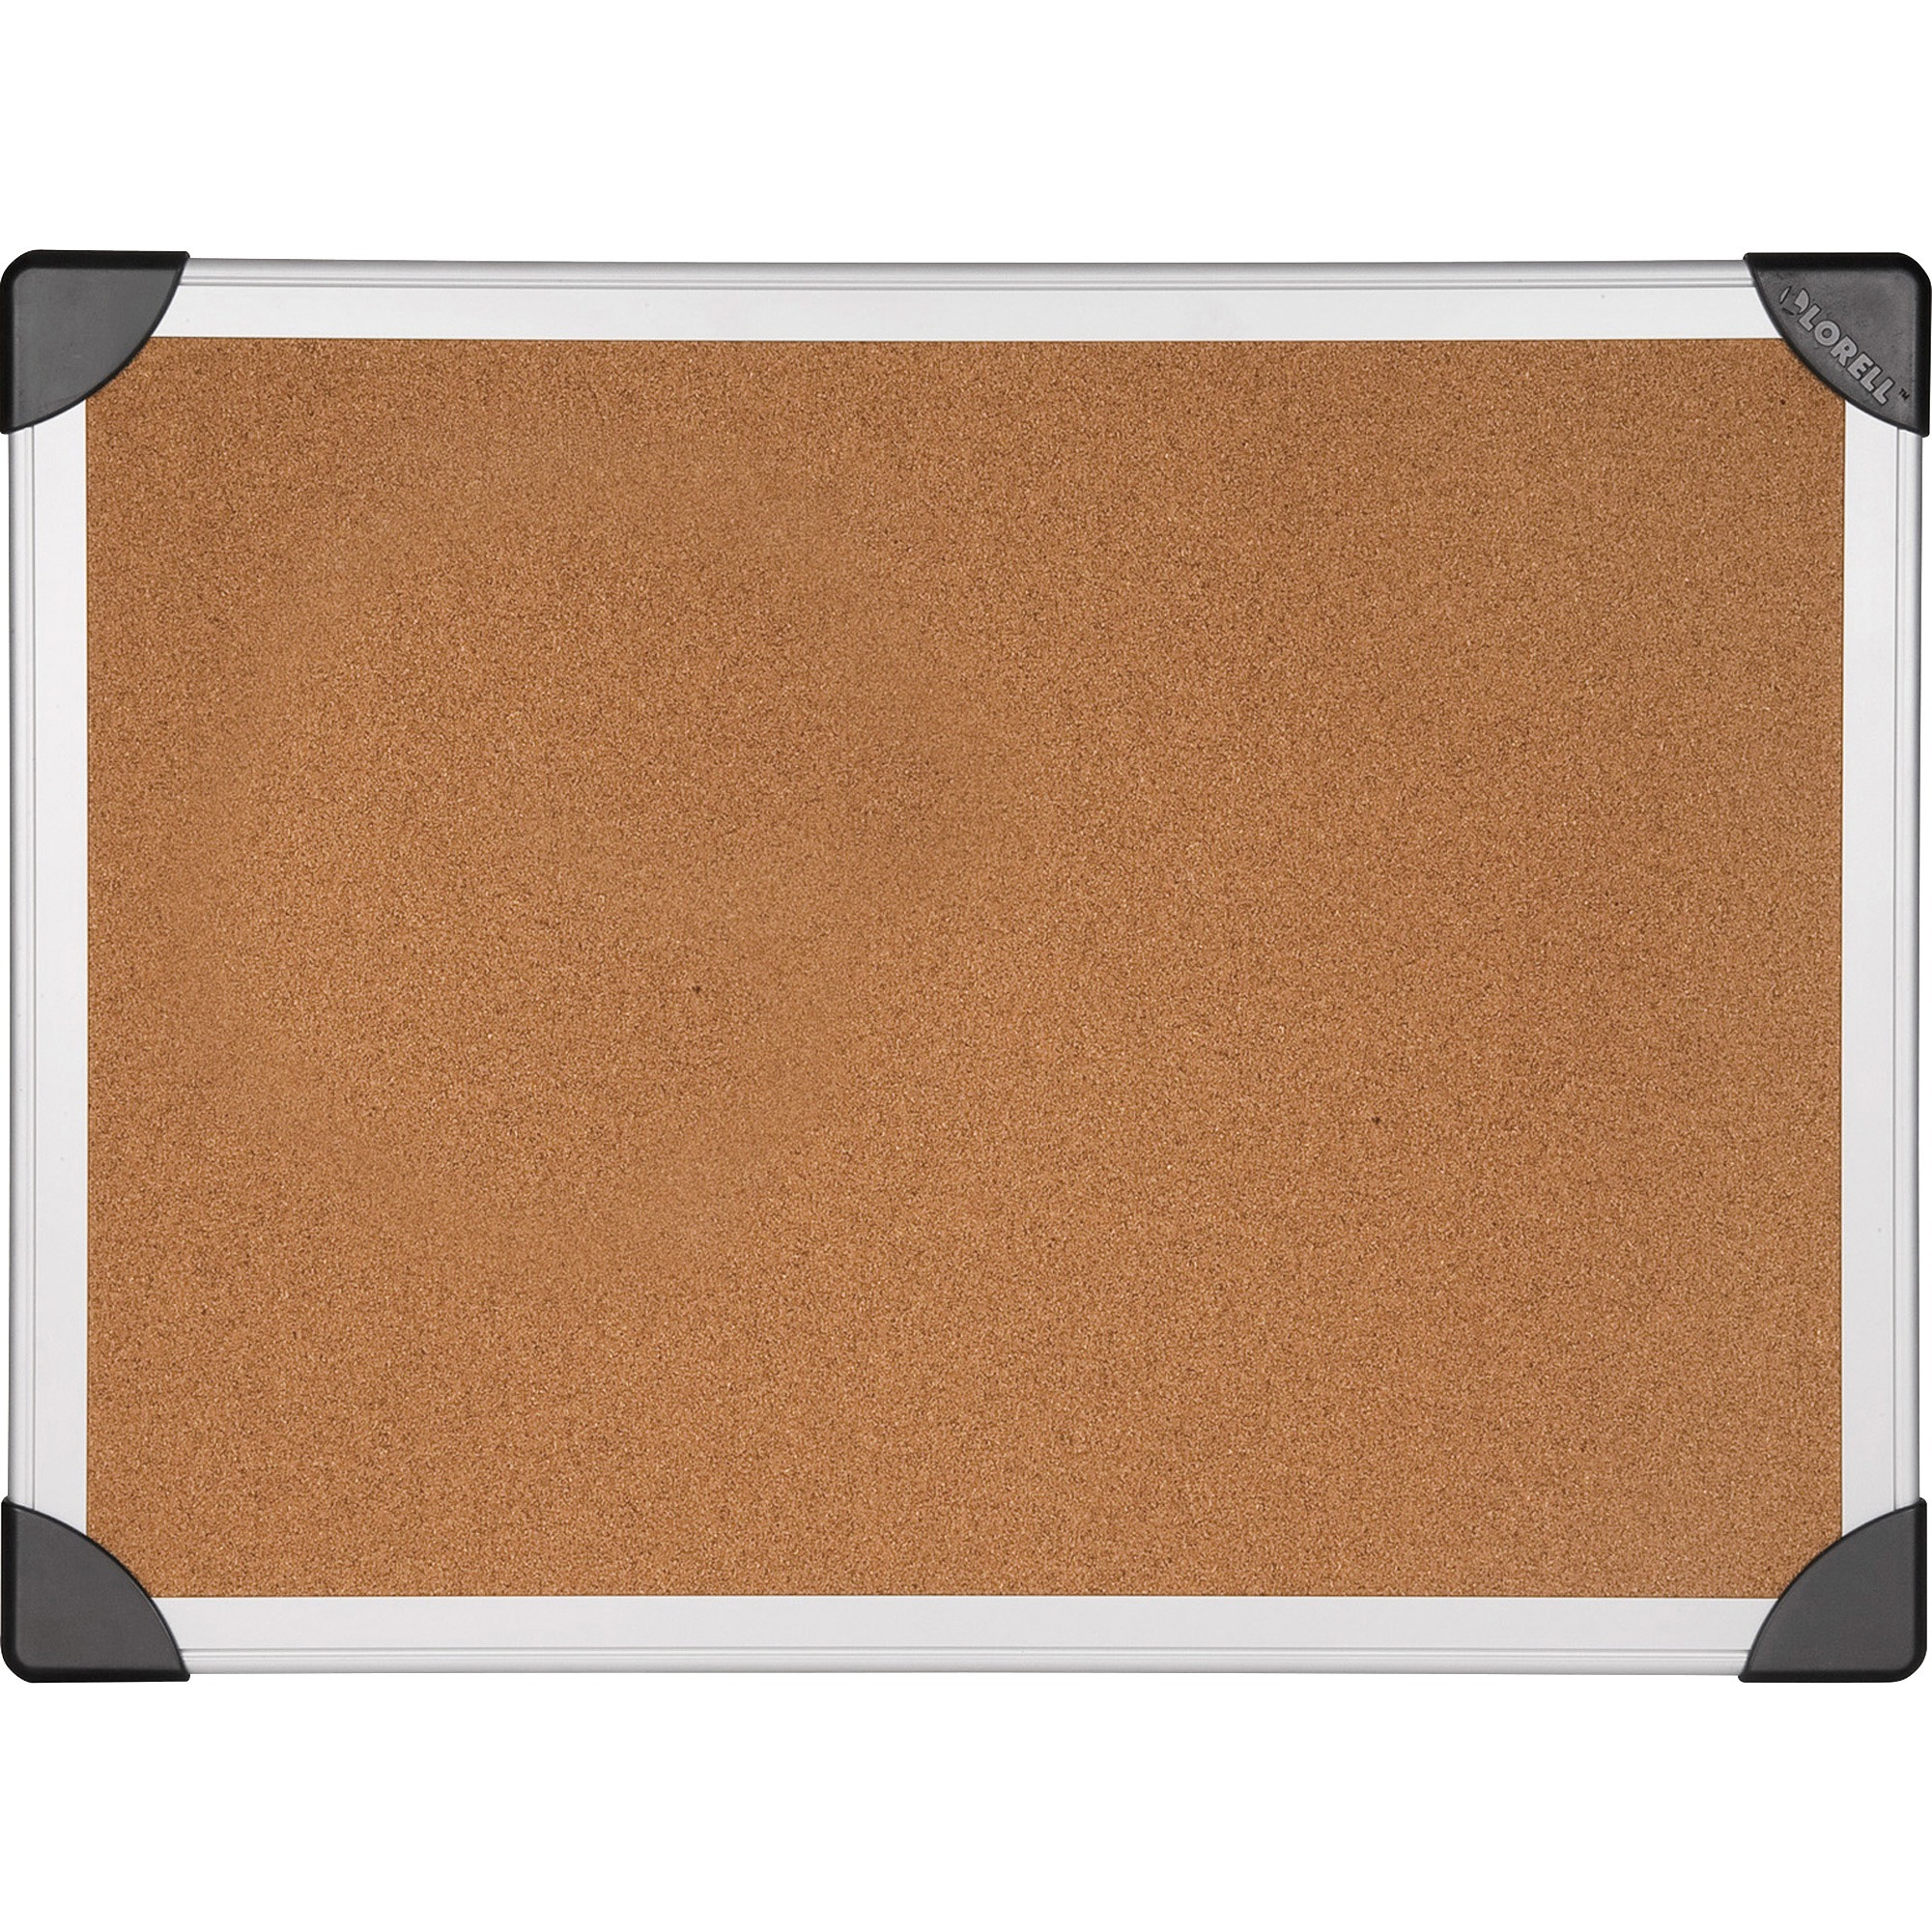 Lorell, LLR19193, Mounting Aluminum Frame Corkboards, 1 Each